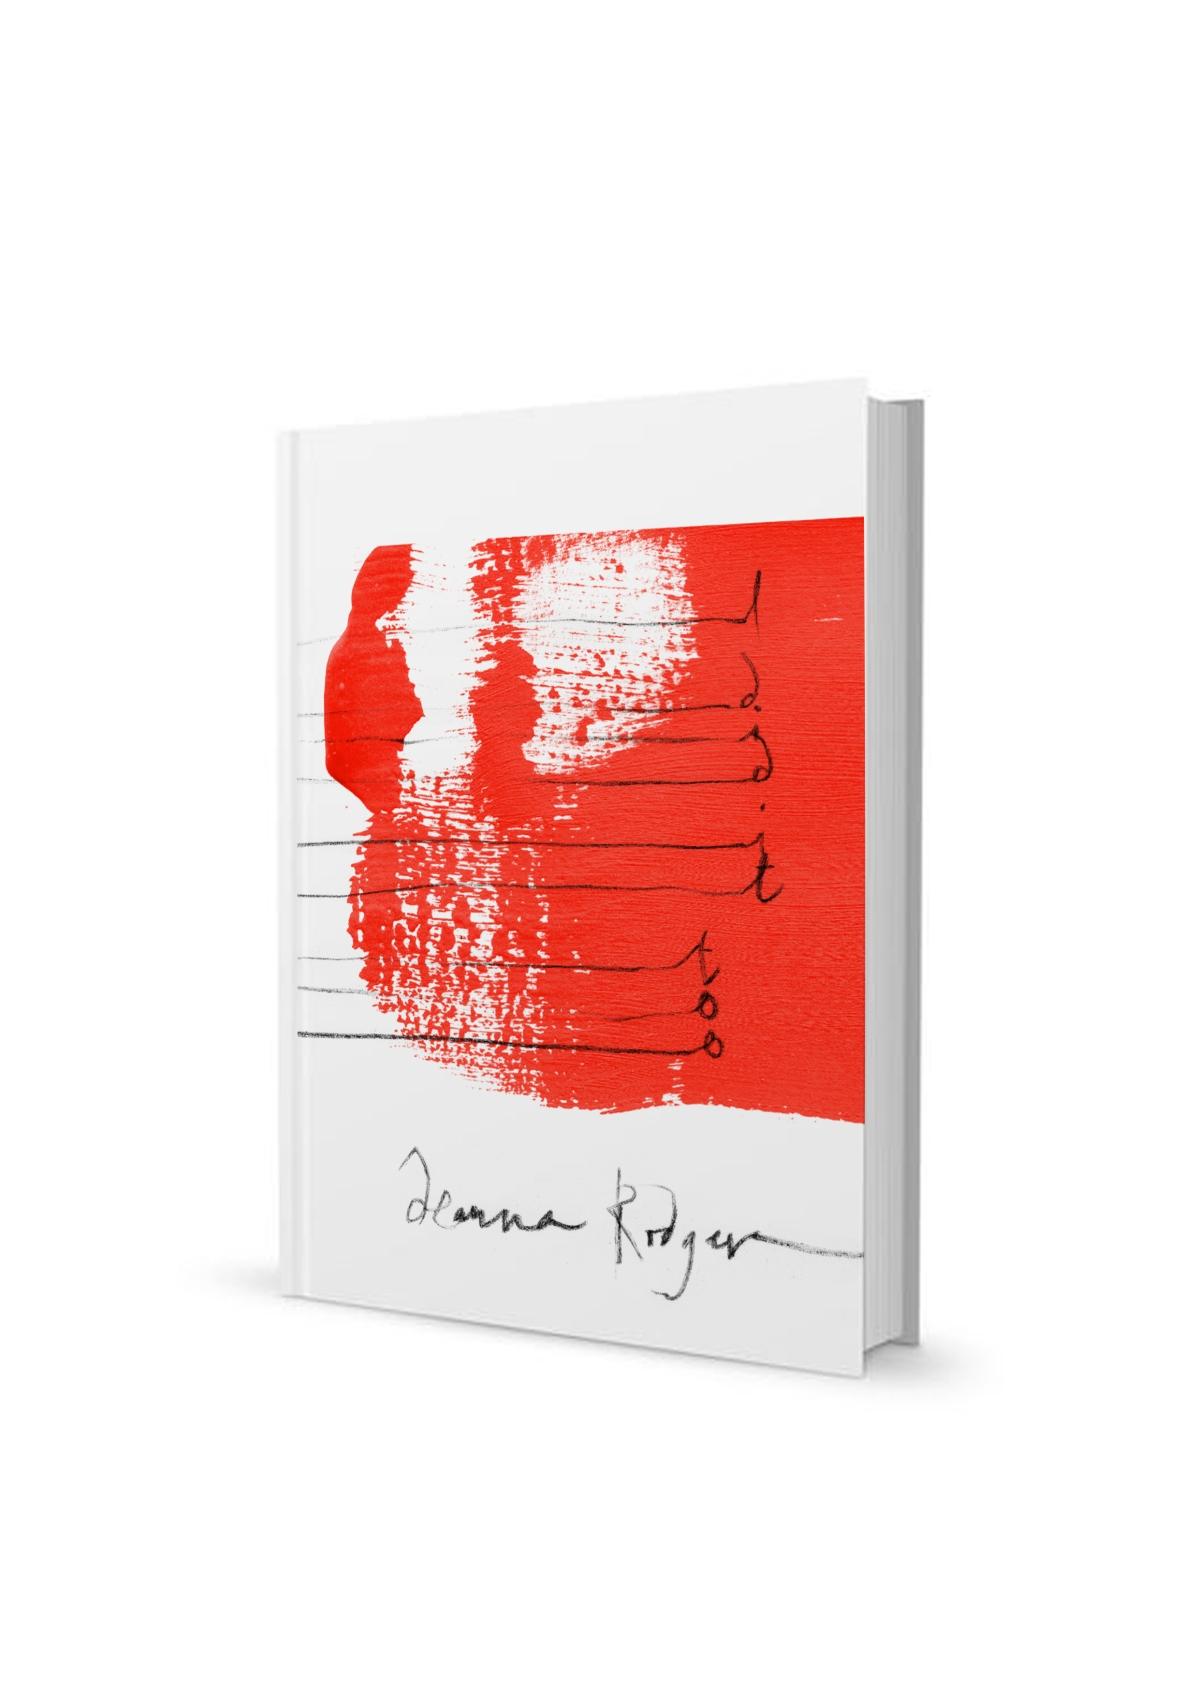 0. joannalayla_bookcover_mockup_liar_1